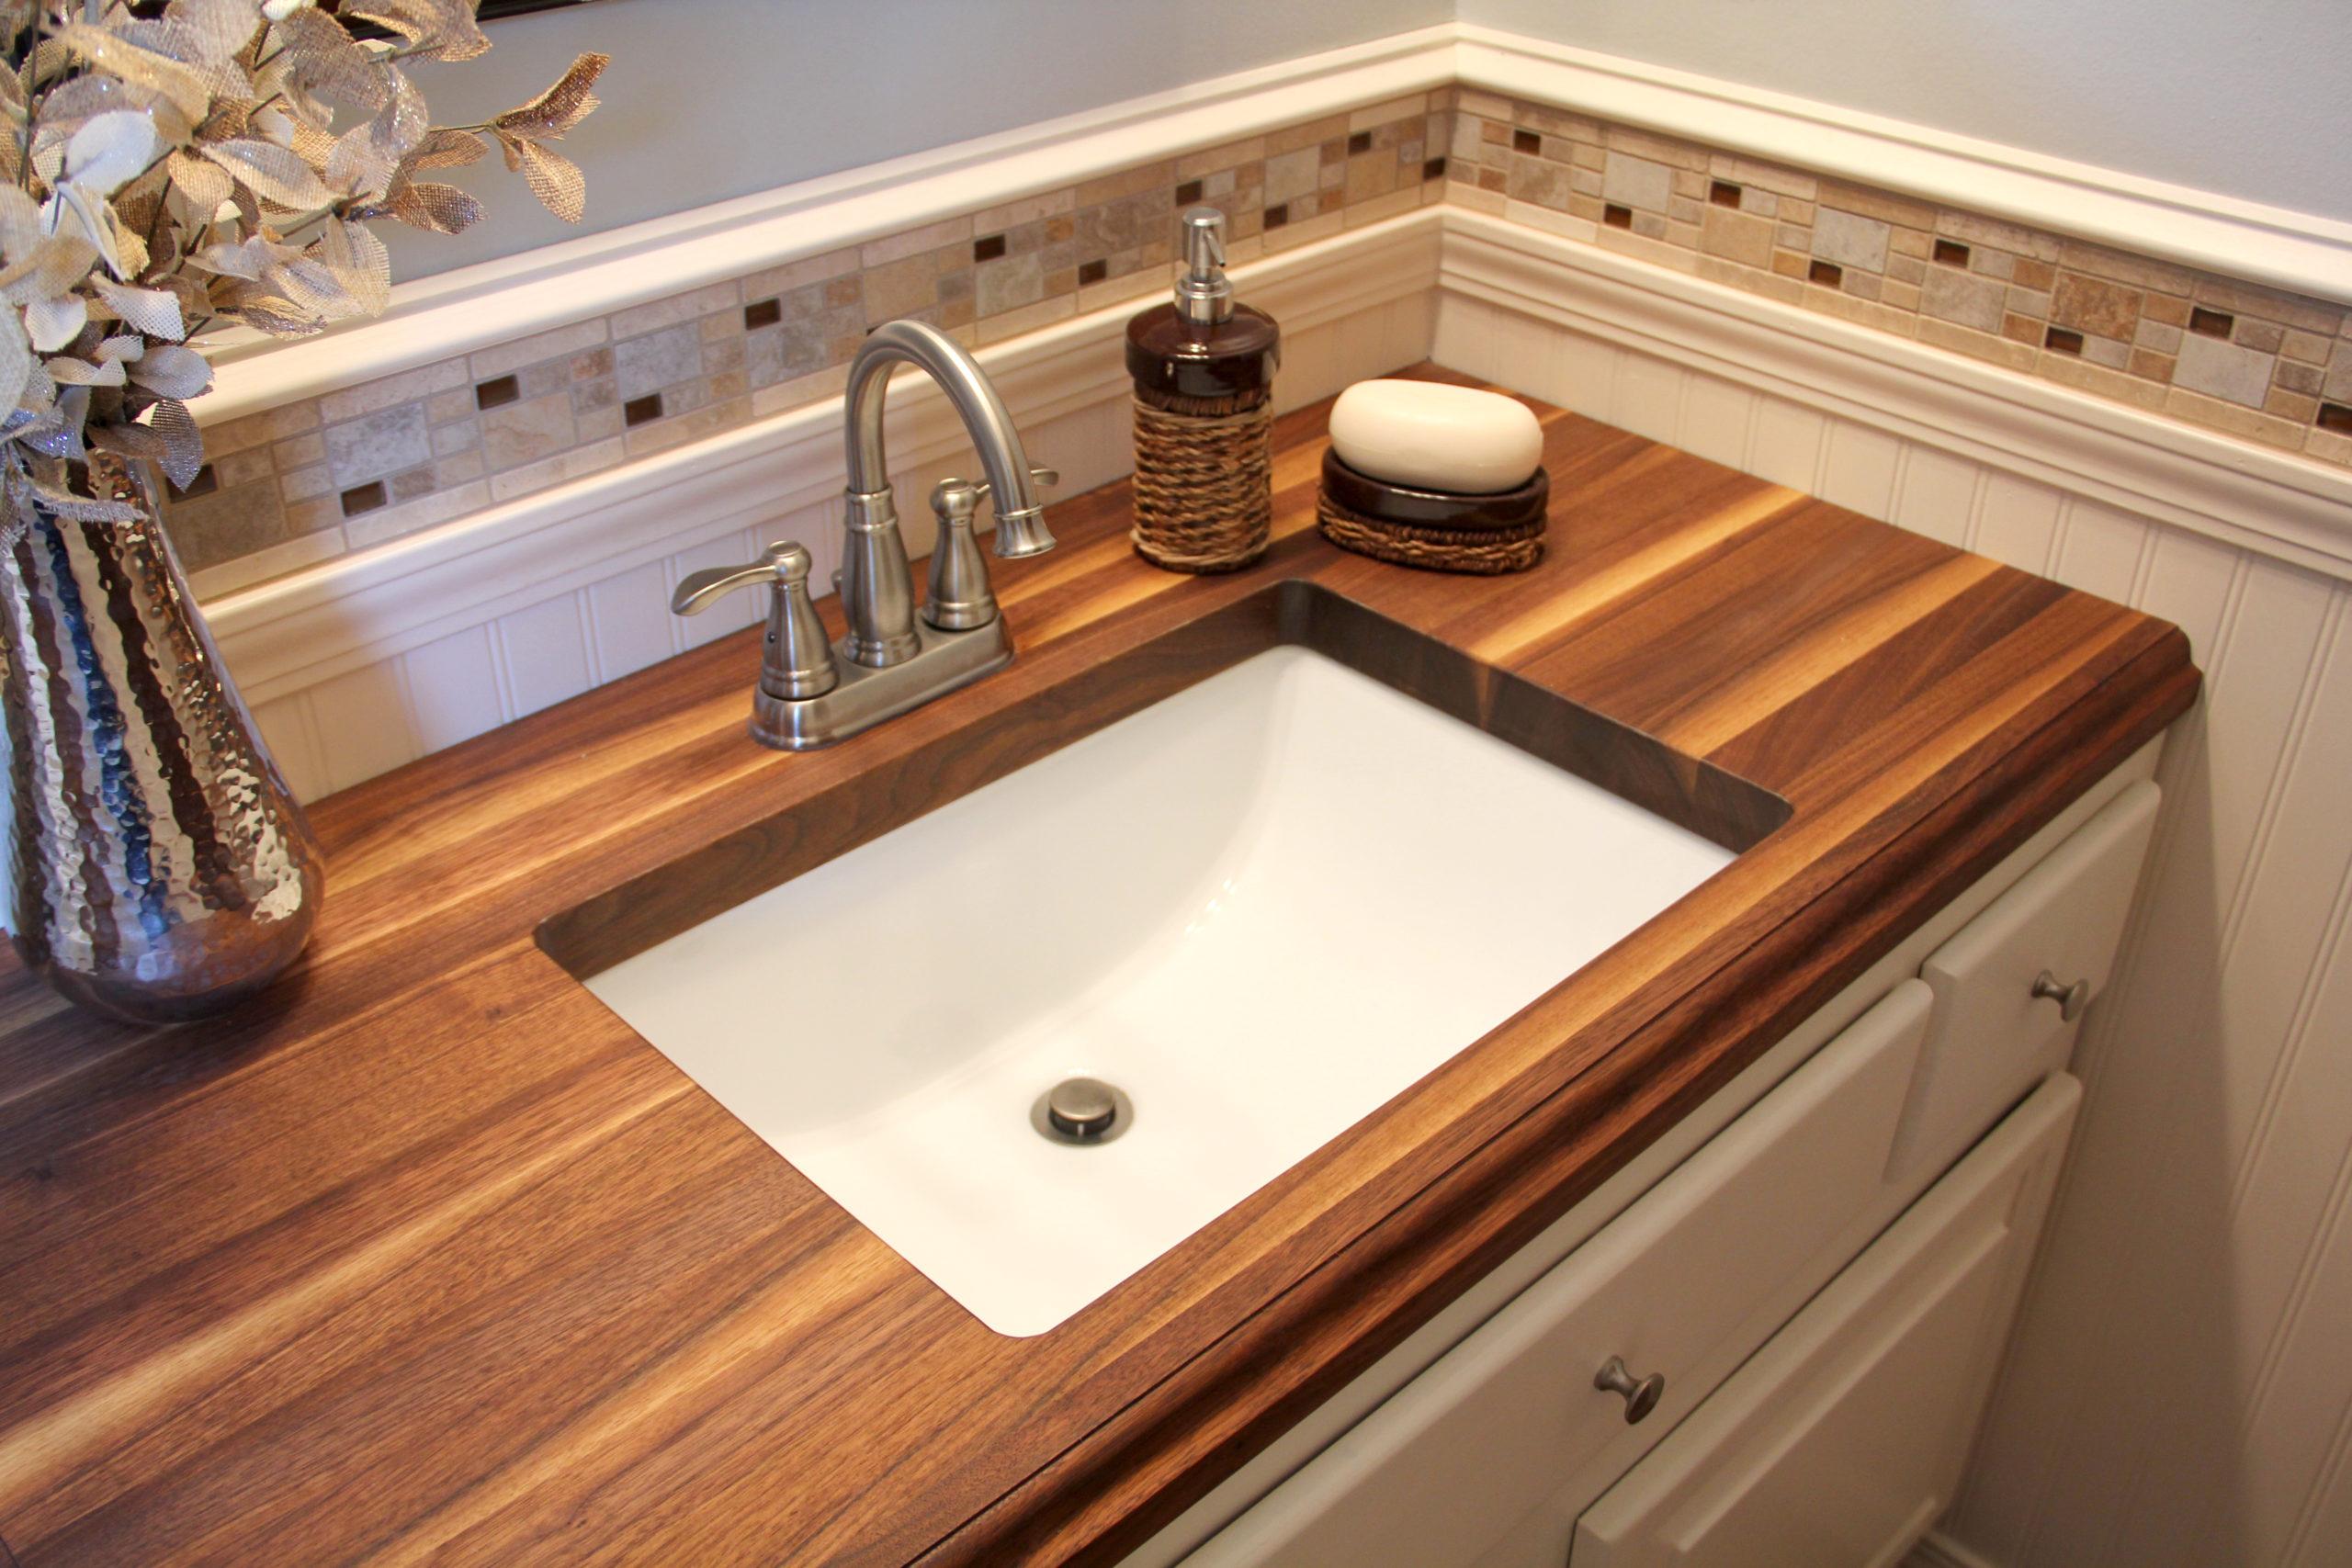 engrain wood countertops